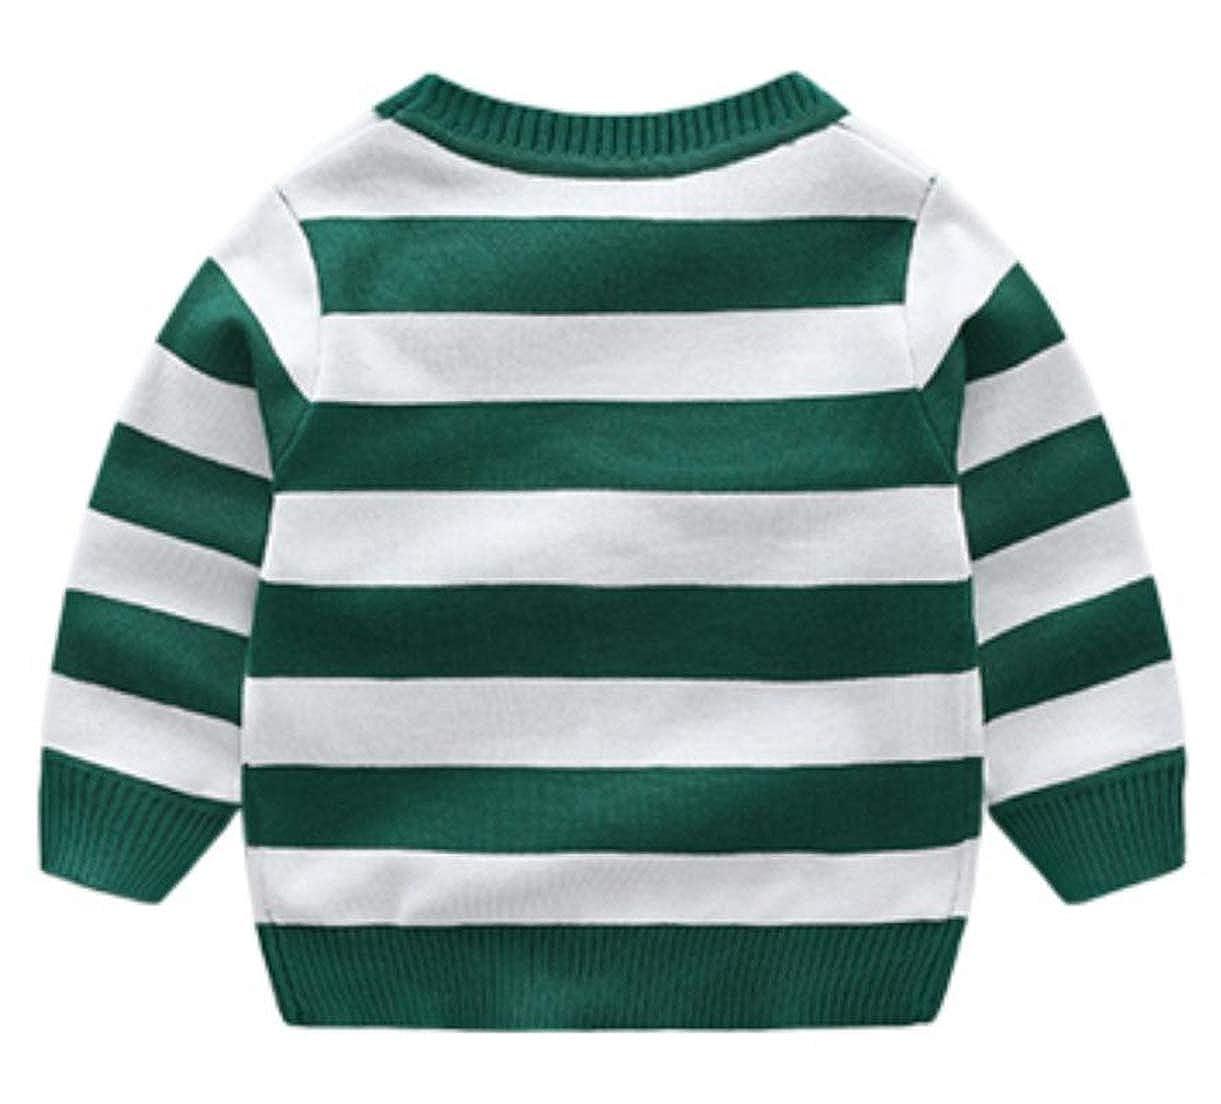 Hajotrawa Girls and Boys Knit Long Sleeve Children Tops Sweaters Cardigans